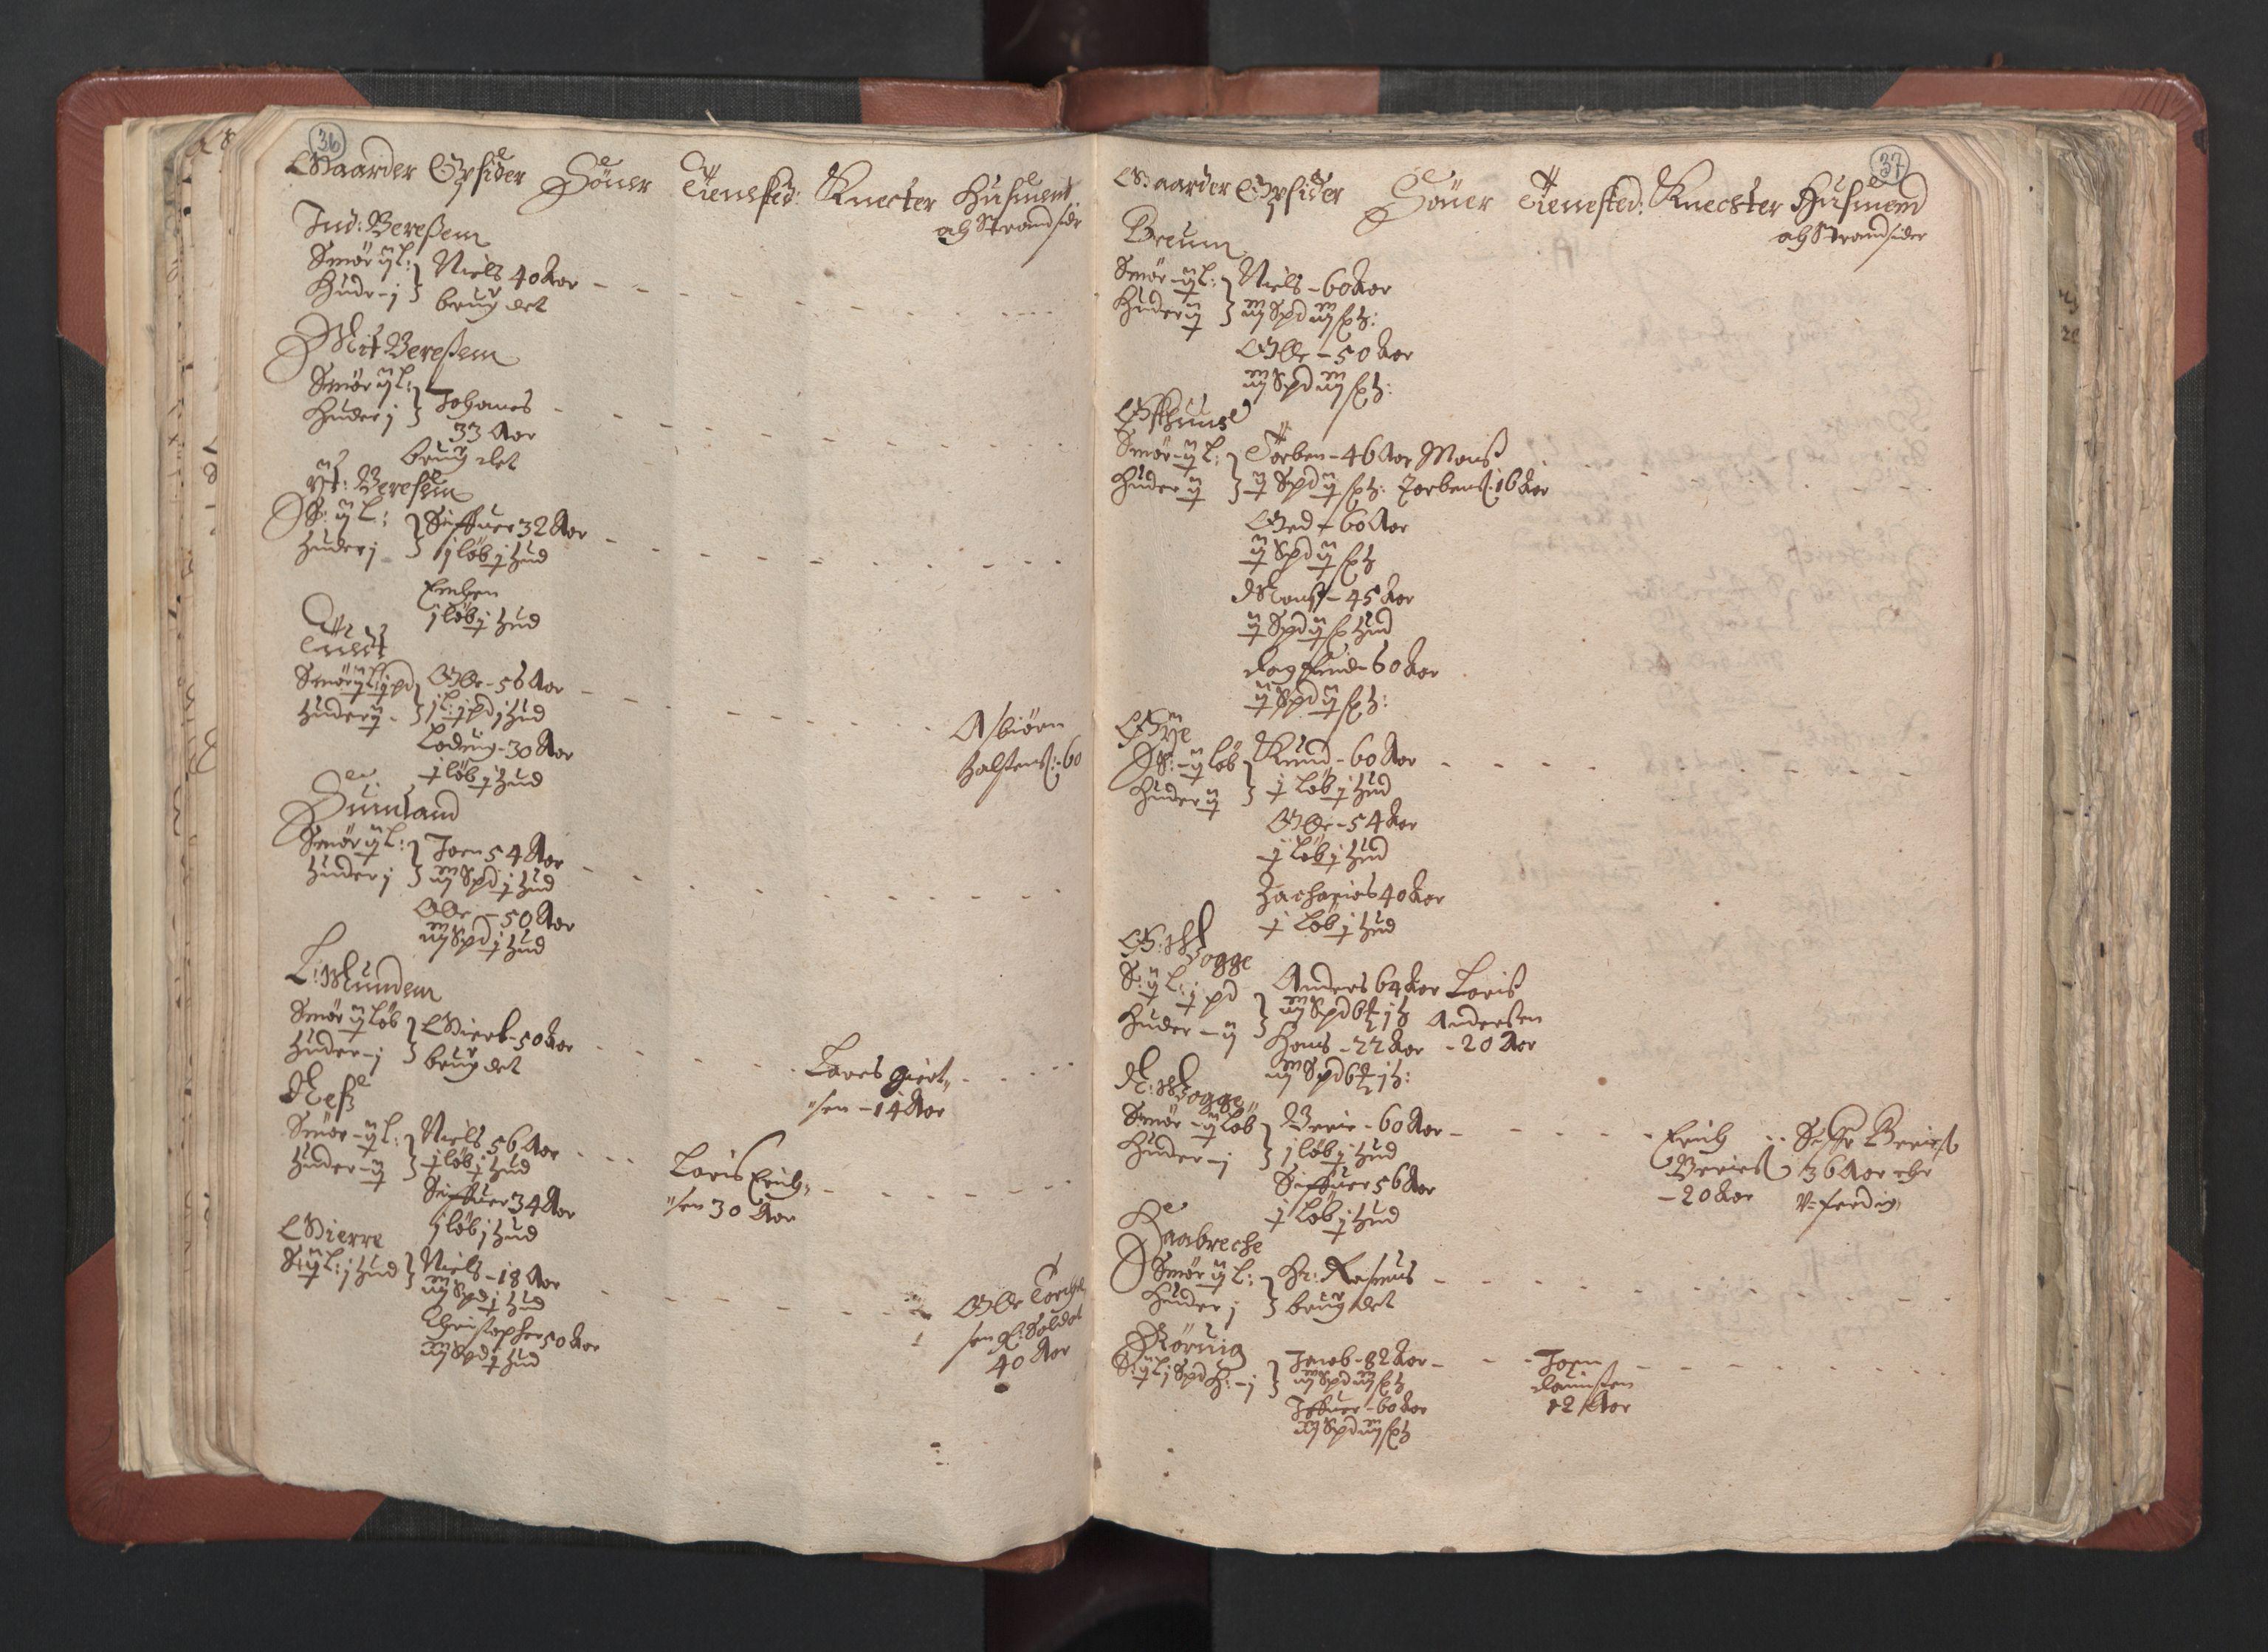 RA, Fogdenes og sorenskrivernes manntall 1664-1666, nr. 13: Nordhordland fogderi og Sunnhordland fogderi, 1665, s. 36-37